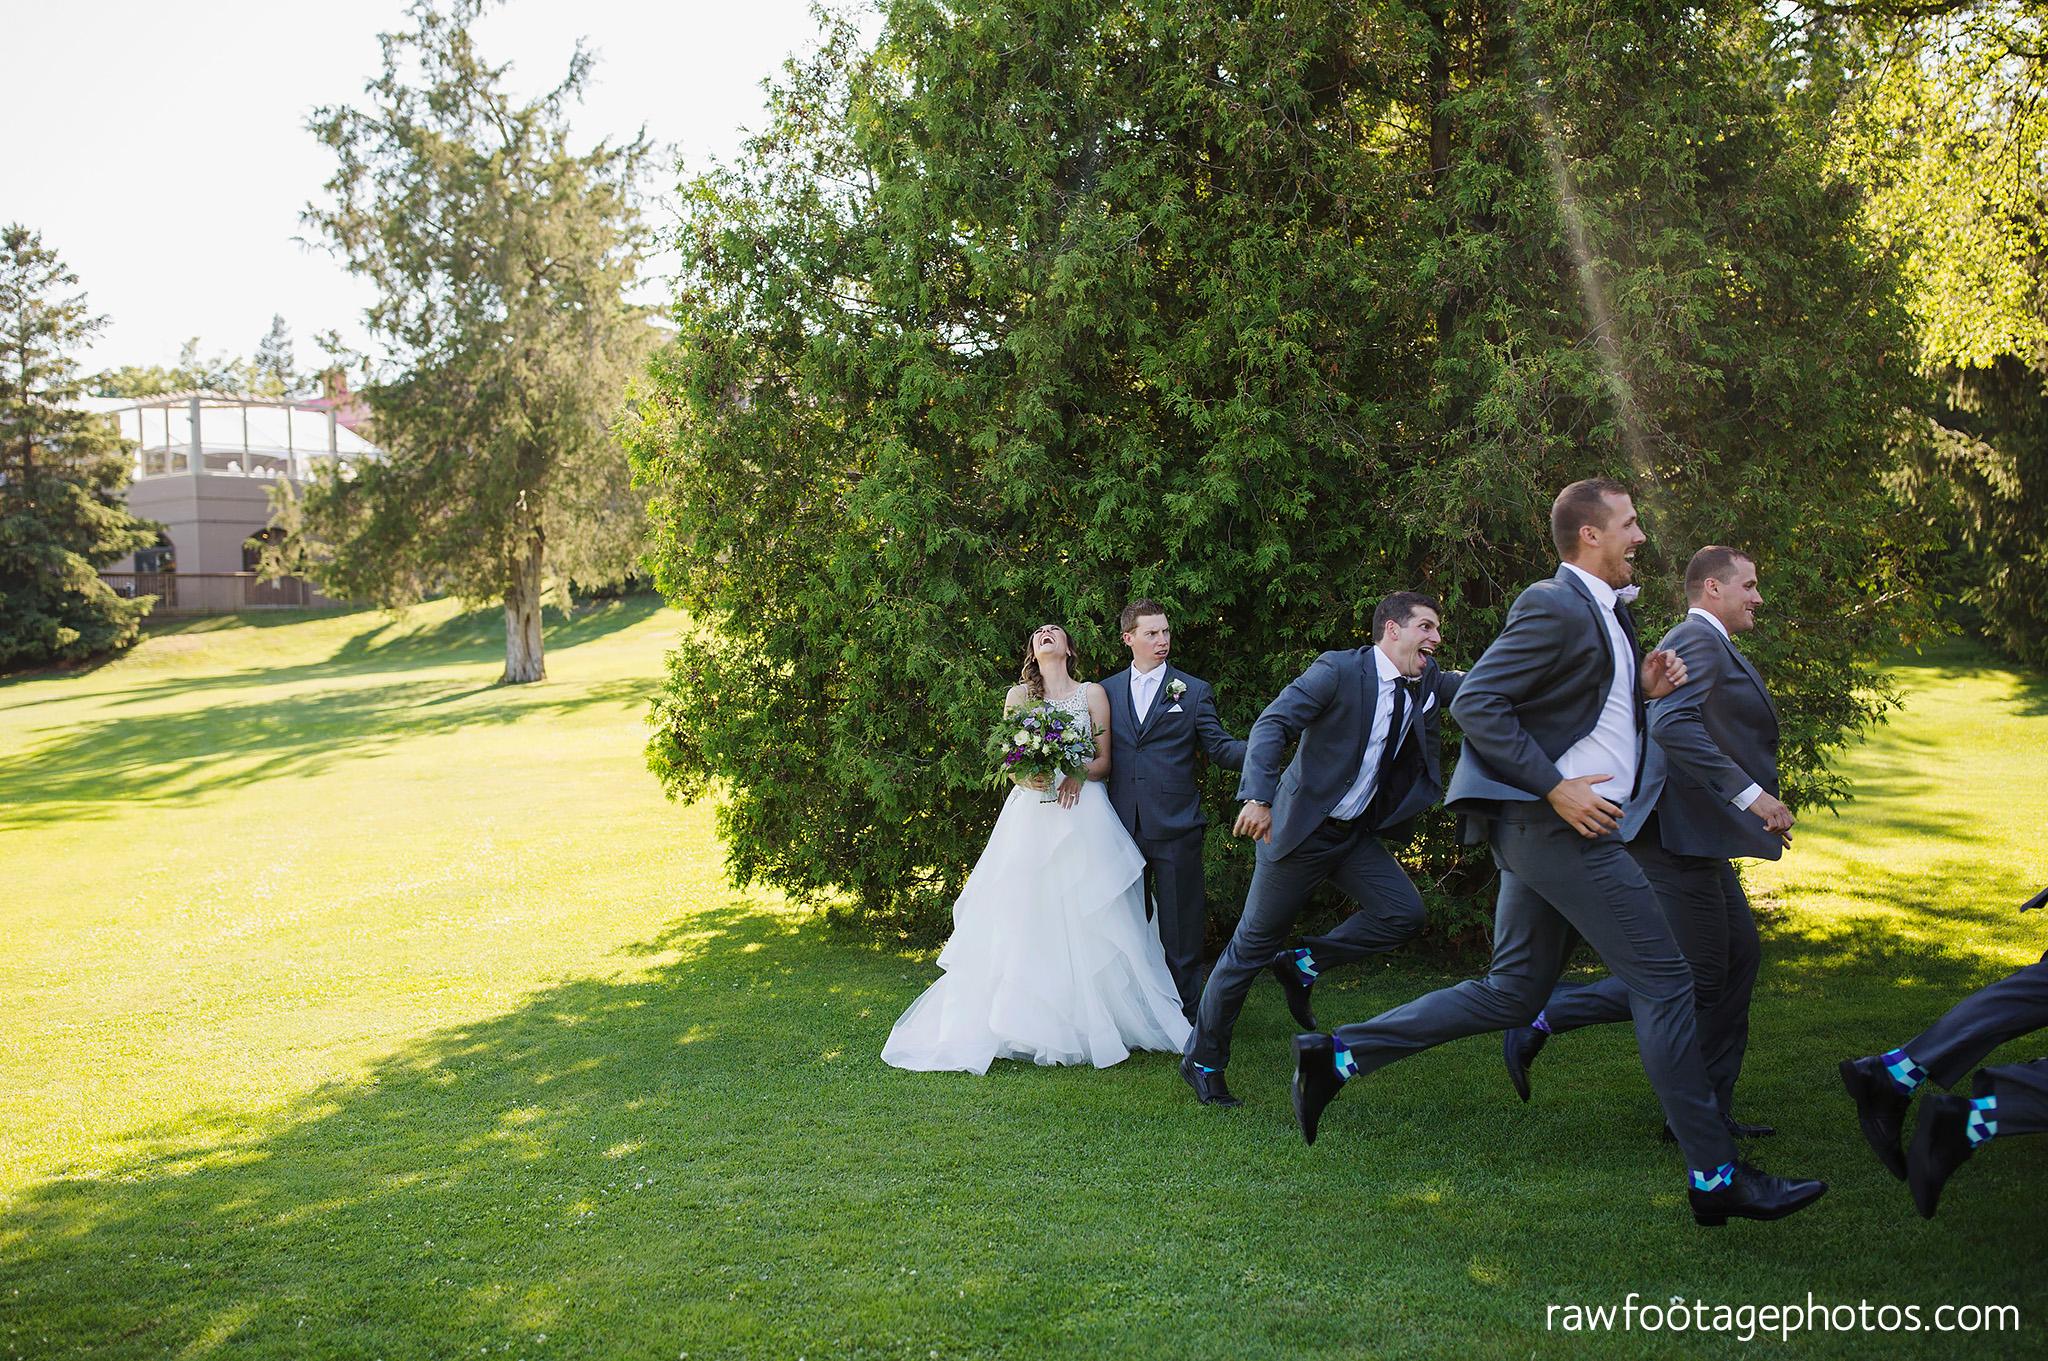 london_ontario_wedding_photographer-grand_bend_wedding_photographer-oakwood_resort_wedding-beach_wedding-sunset_wedding-raw_footage_photography043.jpg